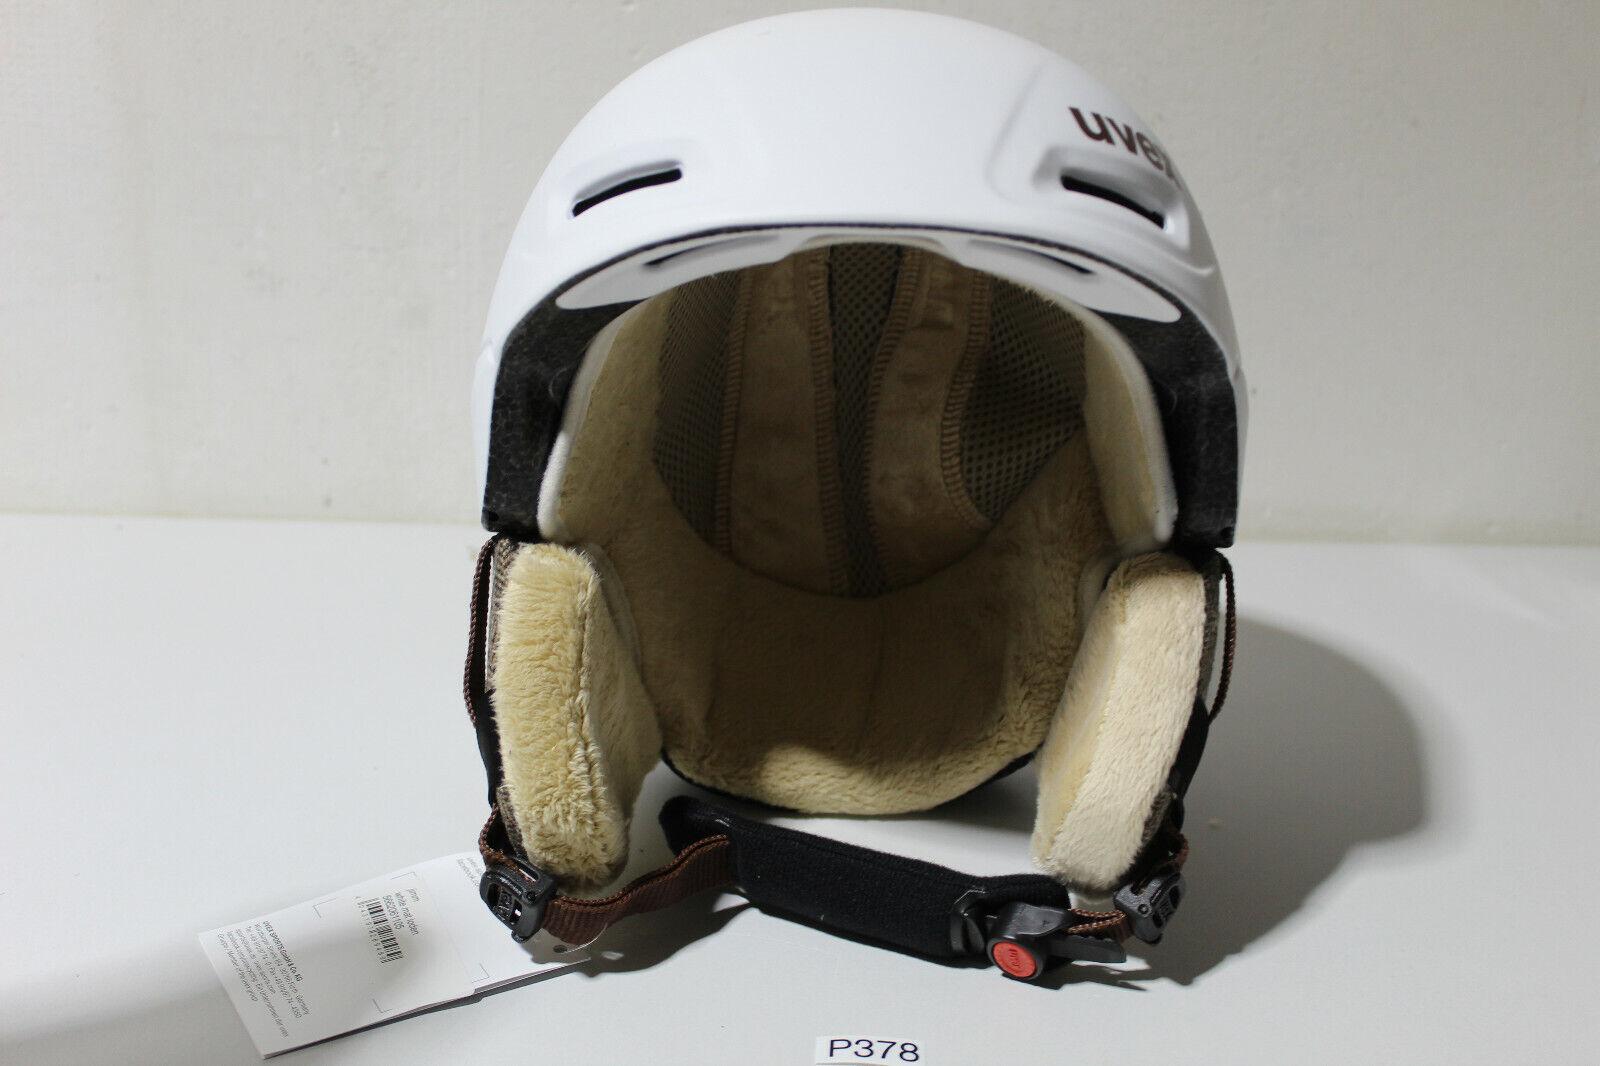 Casco de uvex jimm blancoo Mat loden, tamaño 55 - 59 cm, blancoo (p378 - r27)